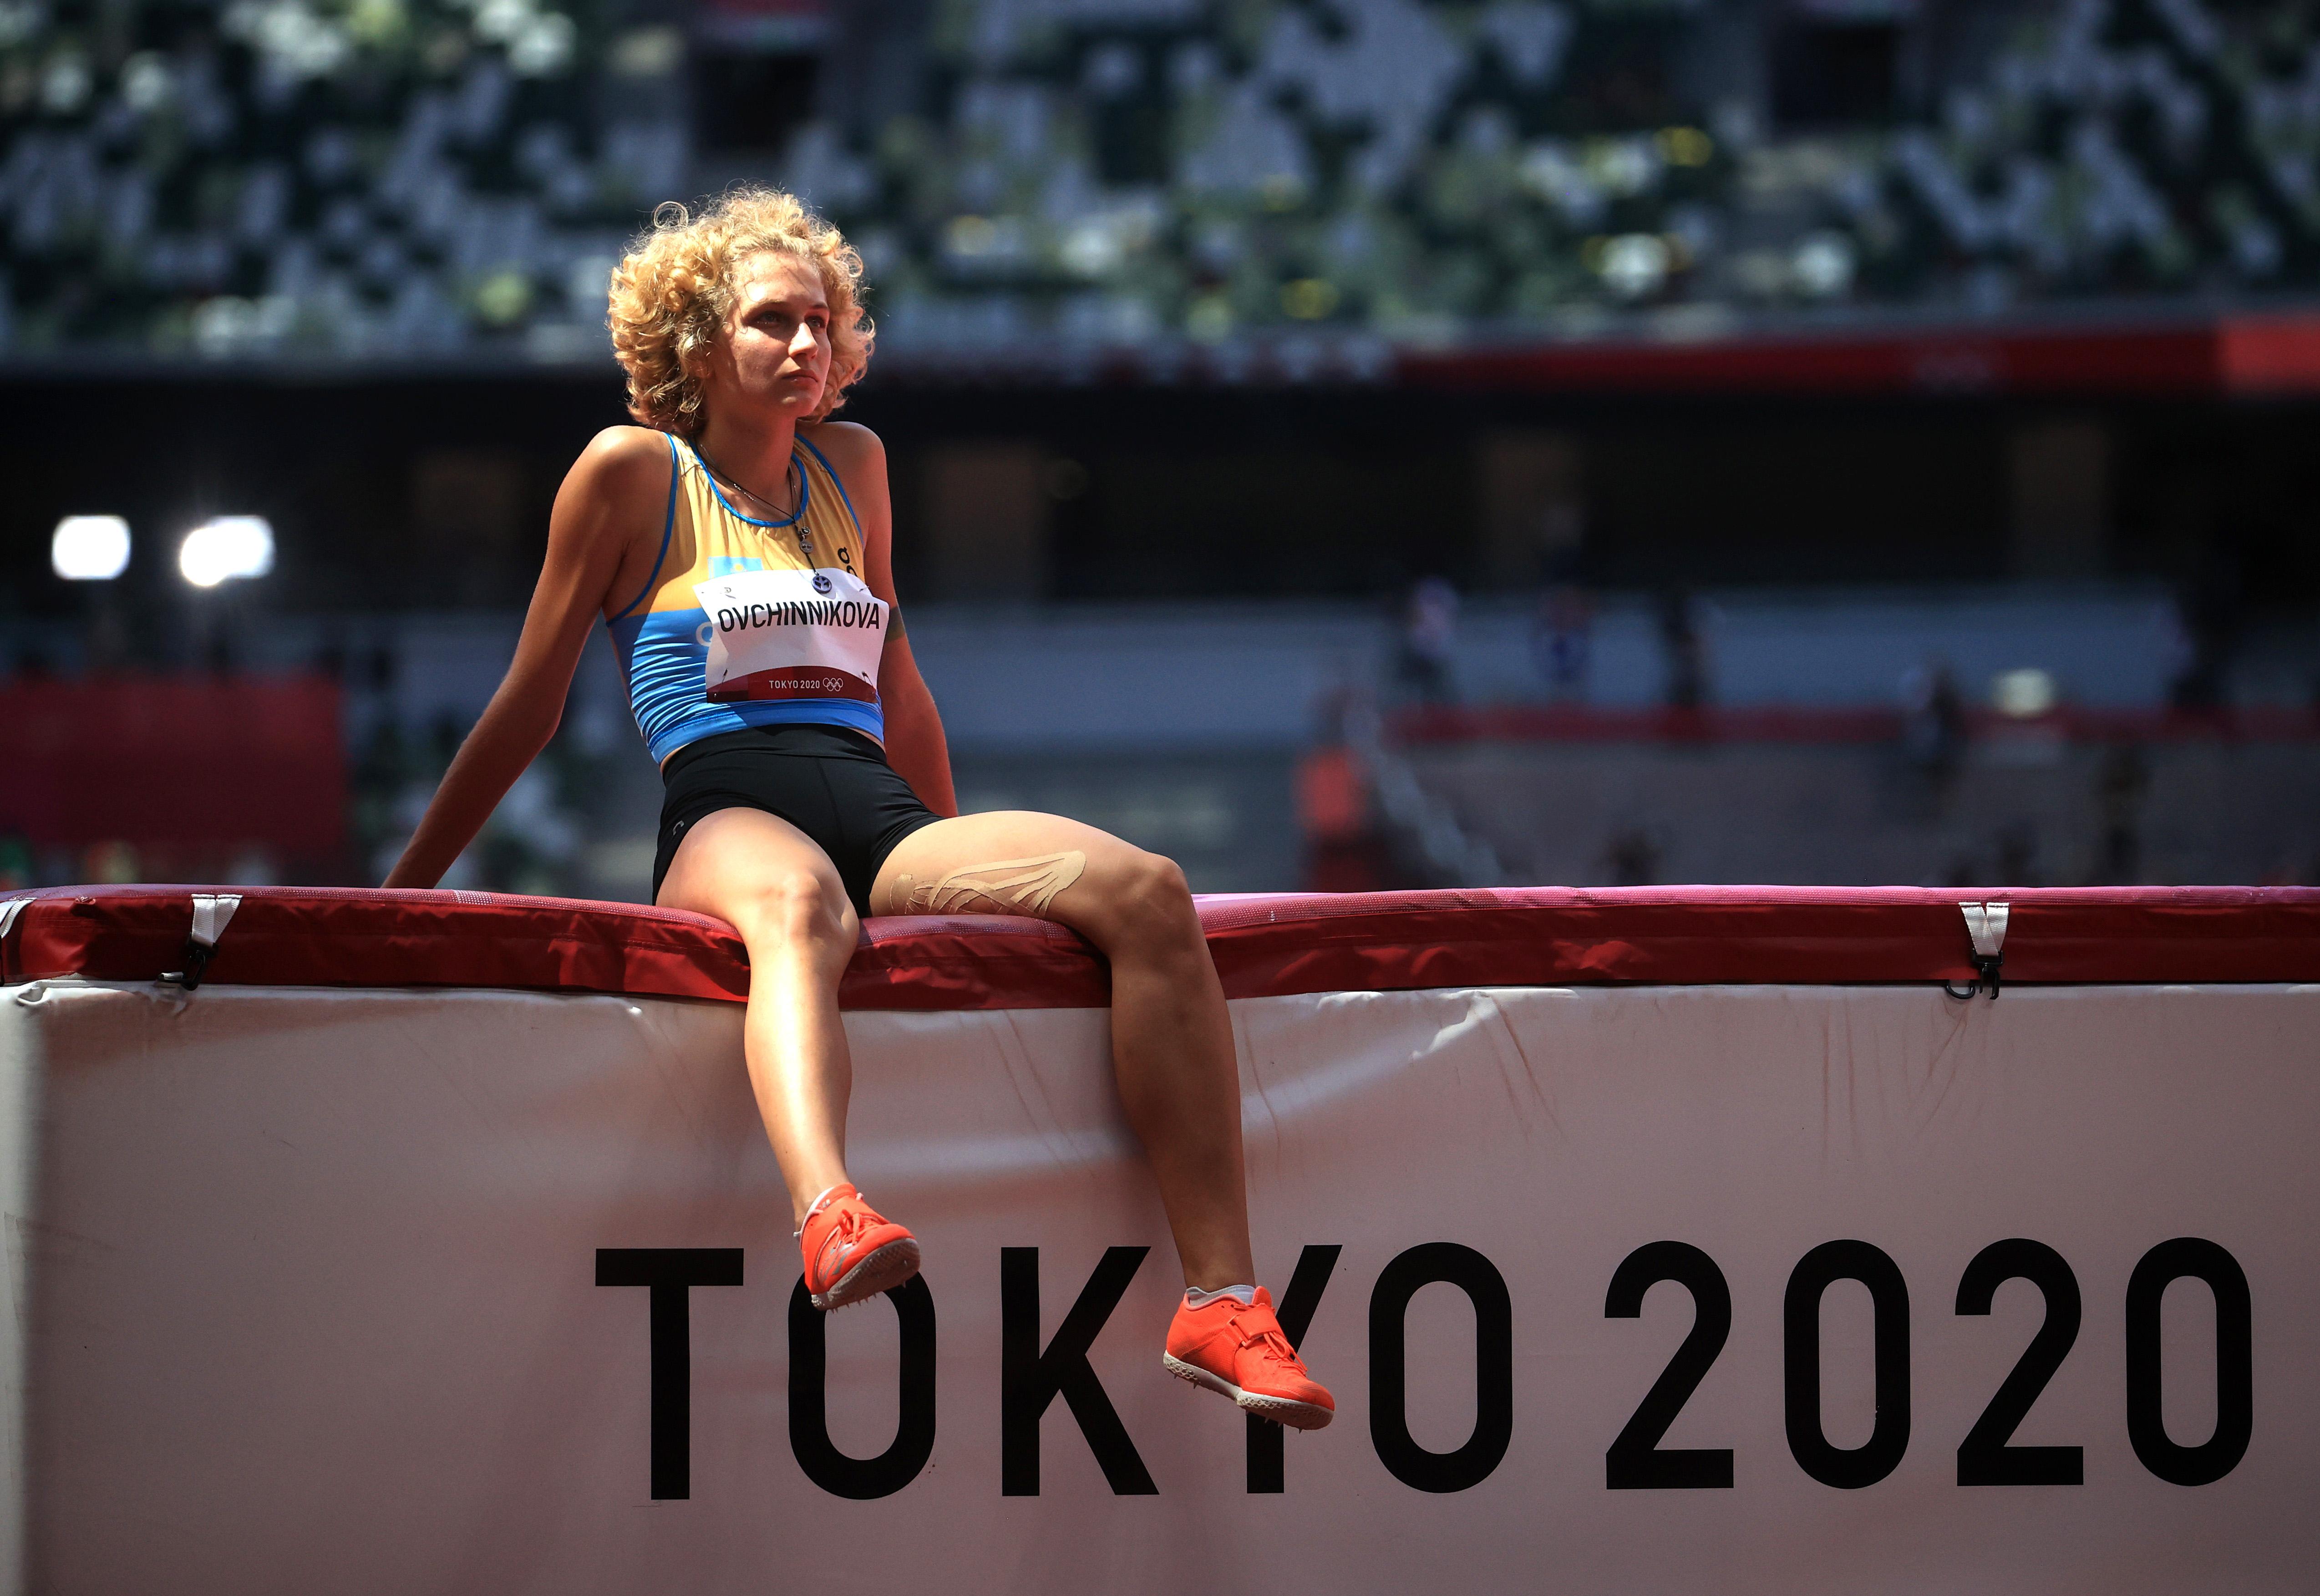 Tokyo 2020 Olympics - Athletics - Women's High Jump - Qualification - Olympic Stadium, Tokyo, Japan - August 5, 2021. Kristina Ovchinnikova of Kazakhstan reacts REUTERS/Hannah Mckay - SP1EH8503XNIA